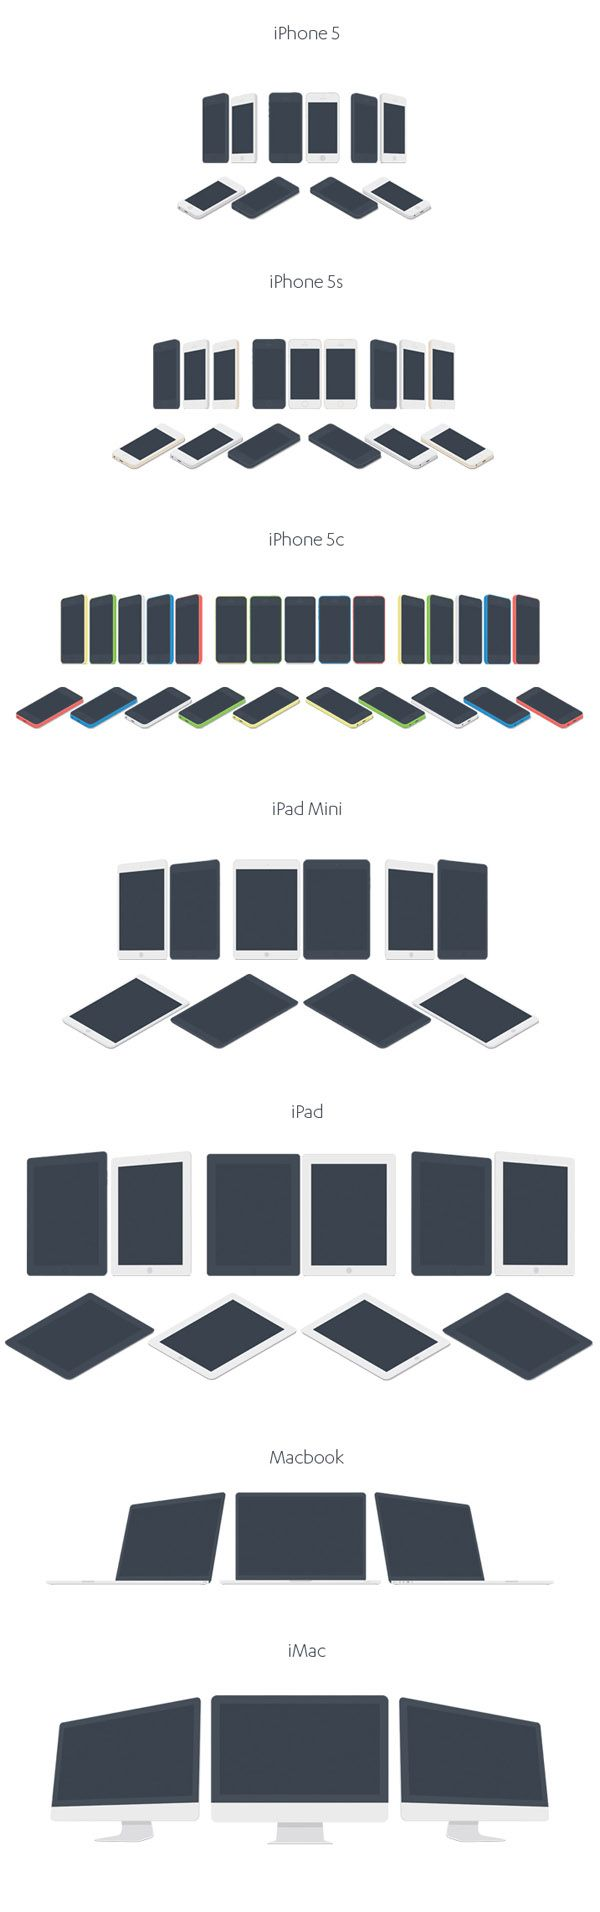 Apple Devices Mockup 7 apple devices, flat mockup, psd mockup, imac mockup, ipad mockup, iphone5c mockup, macbook mockup